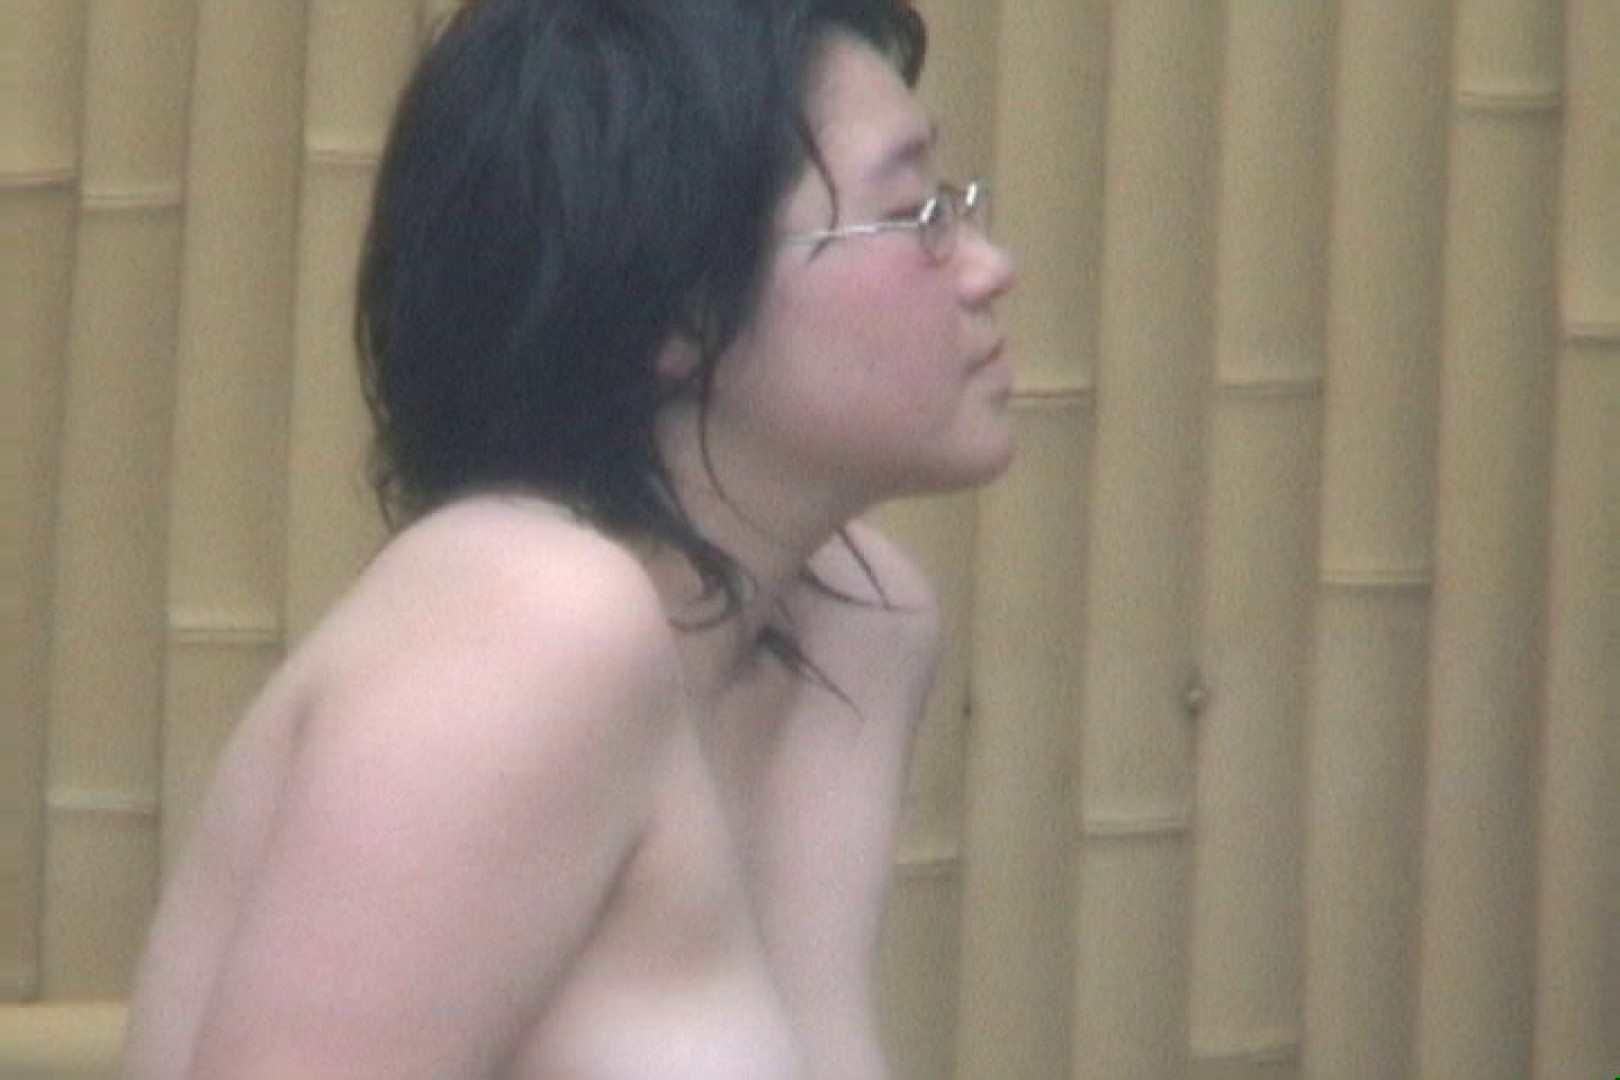 Aquaな露天風呂Vol.46【VIP限定】 OL女体 アダルト動画キャプチャ 98連発 71